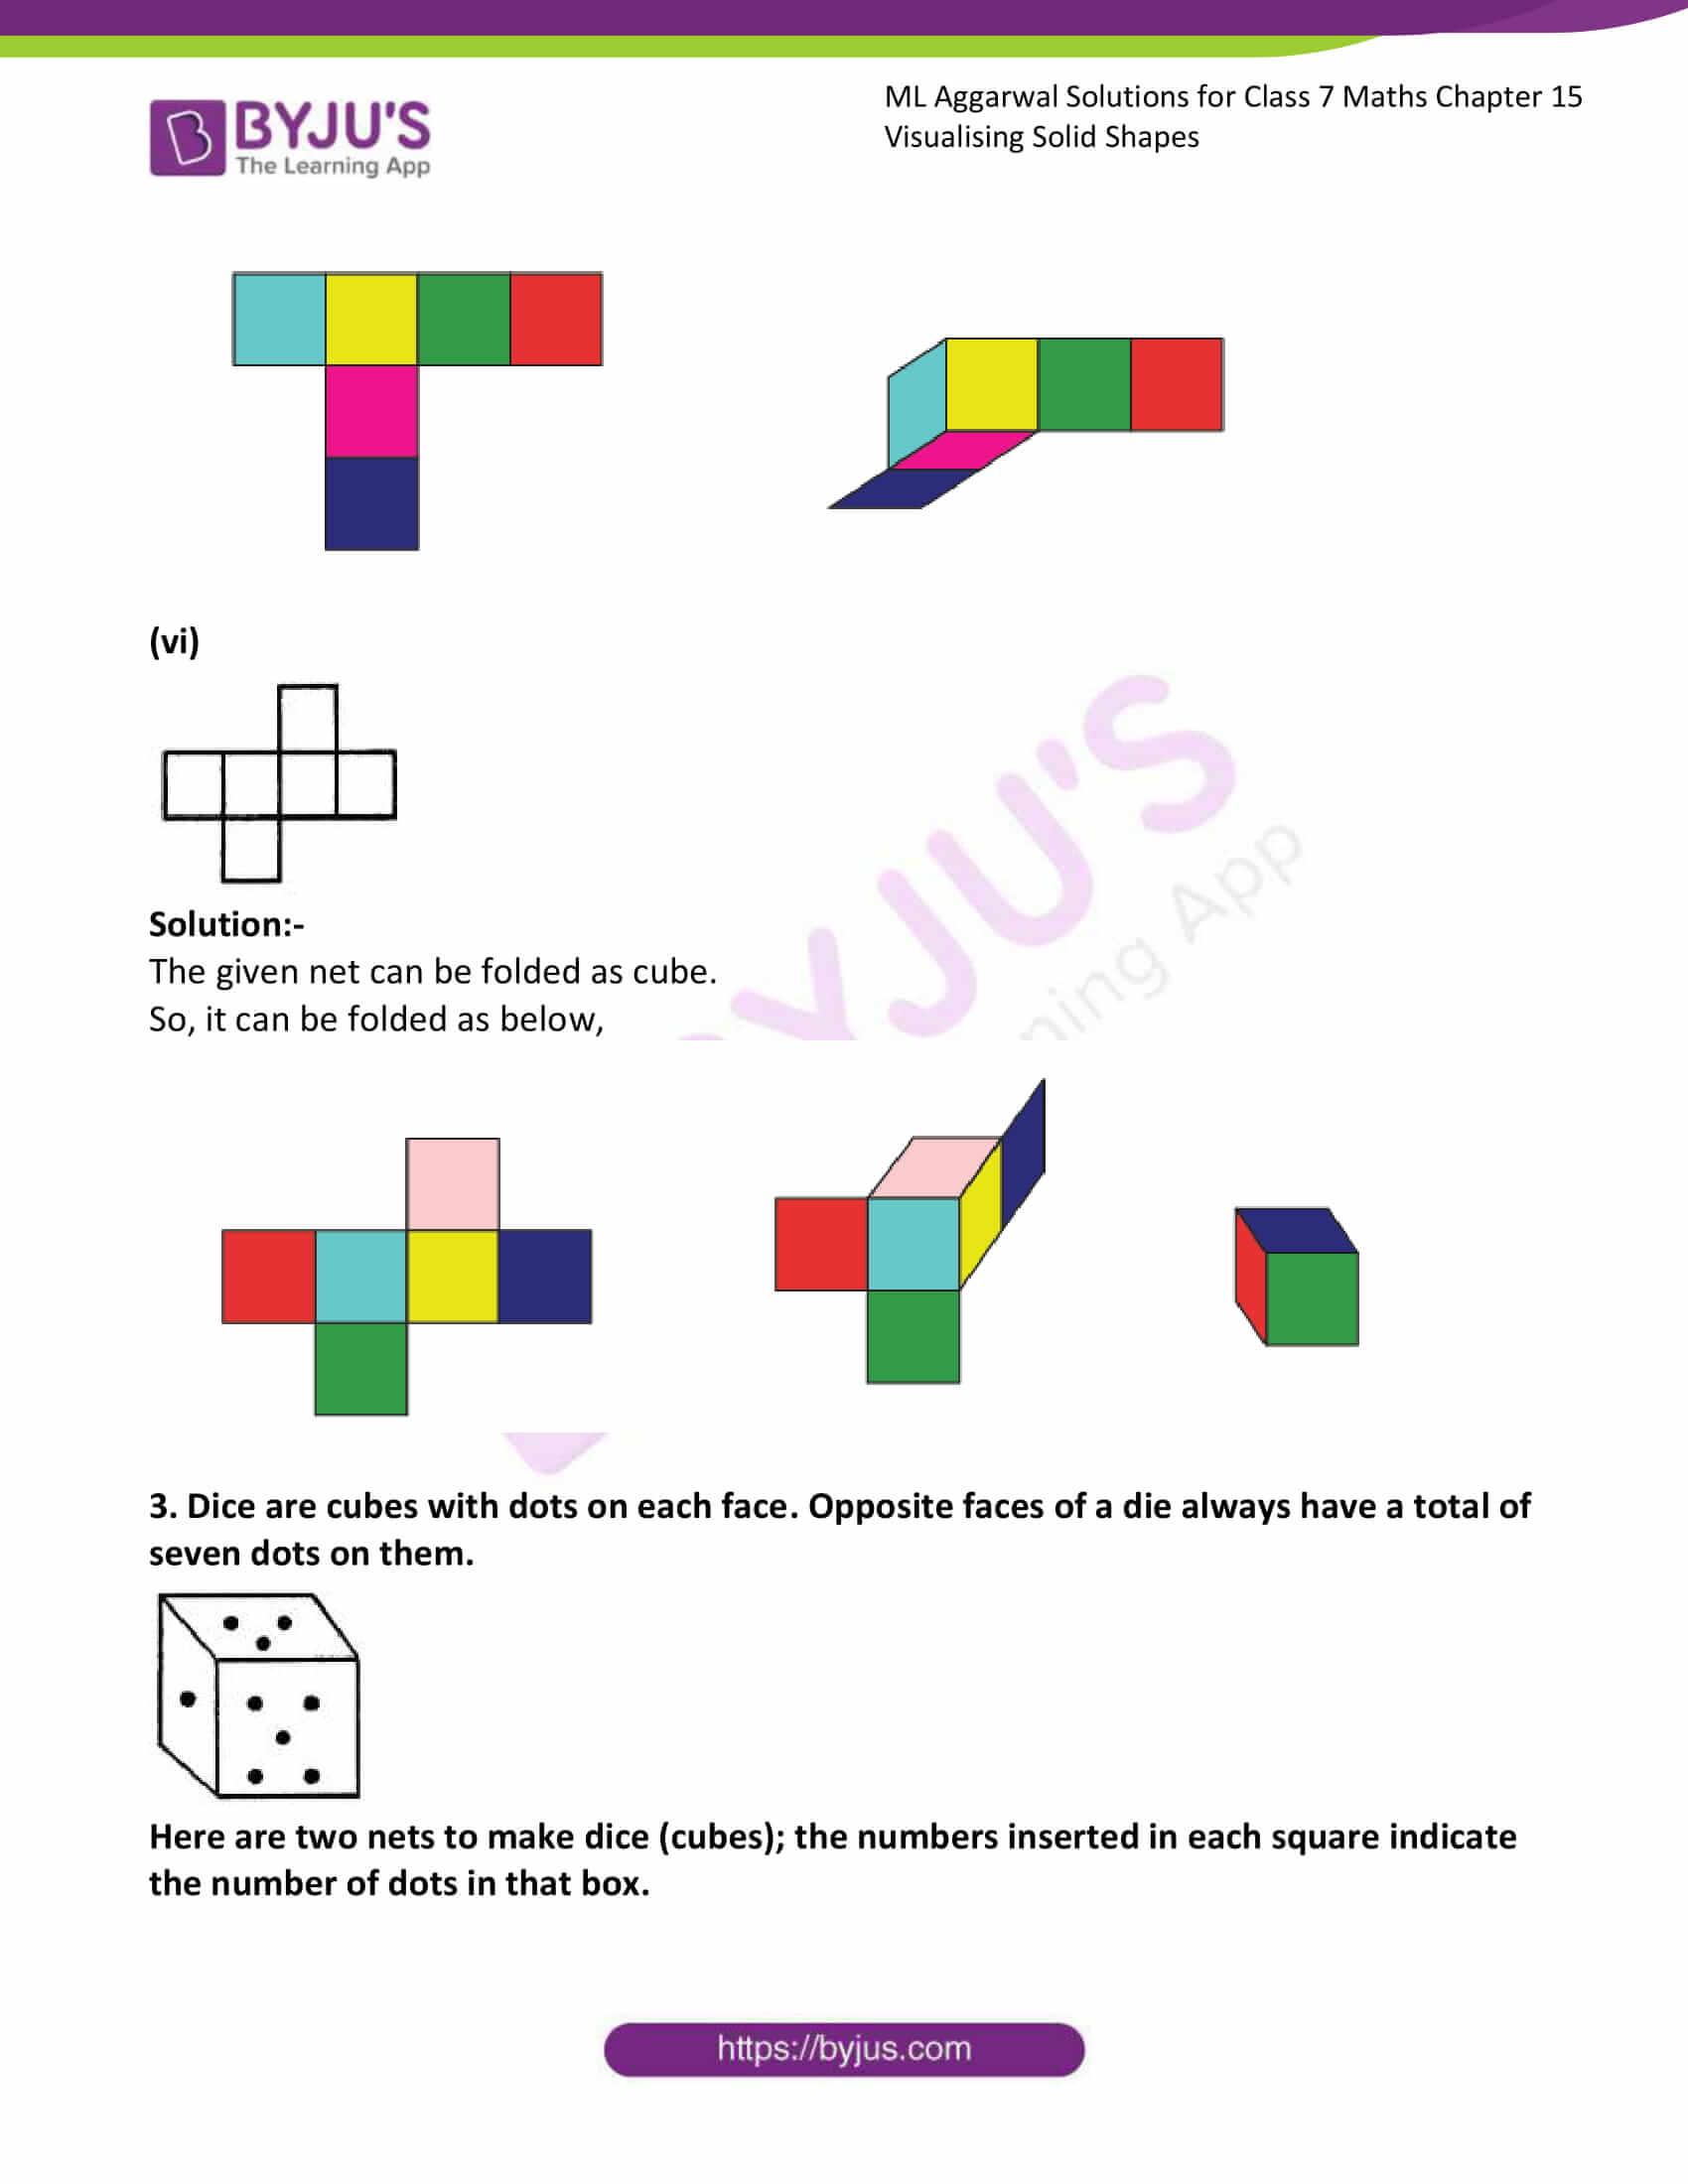 ml aggarwal sol class 7 maths chapter 15 5